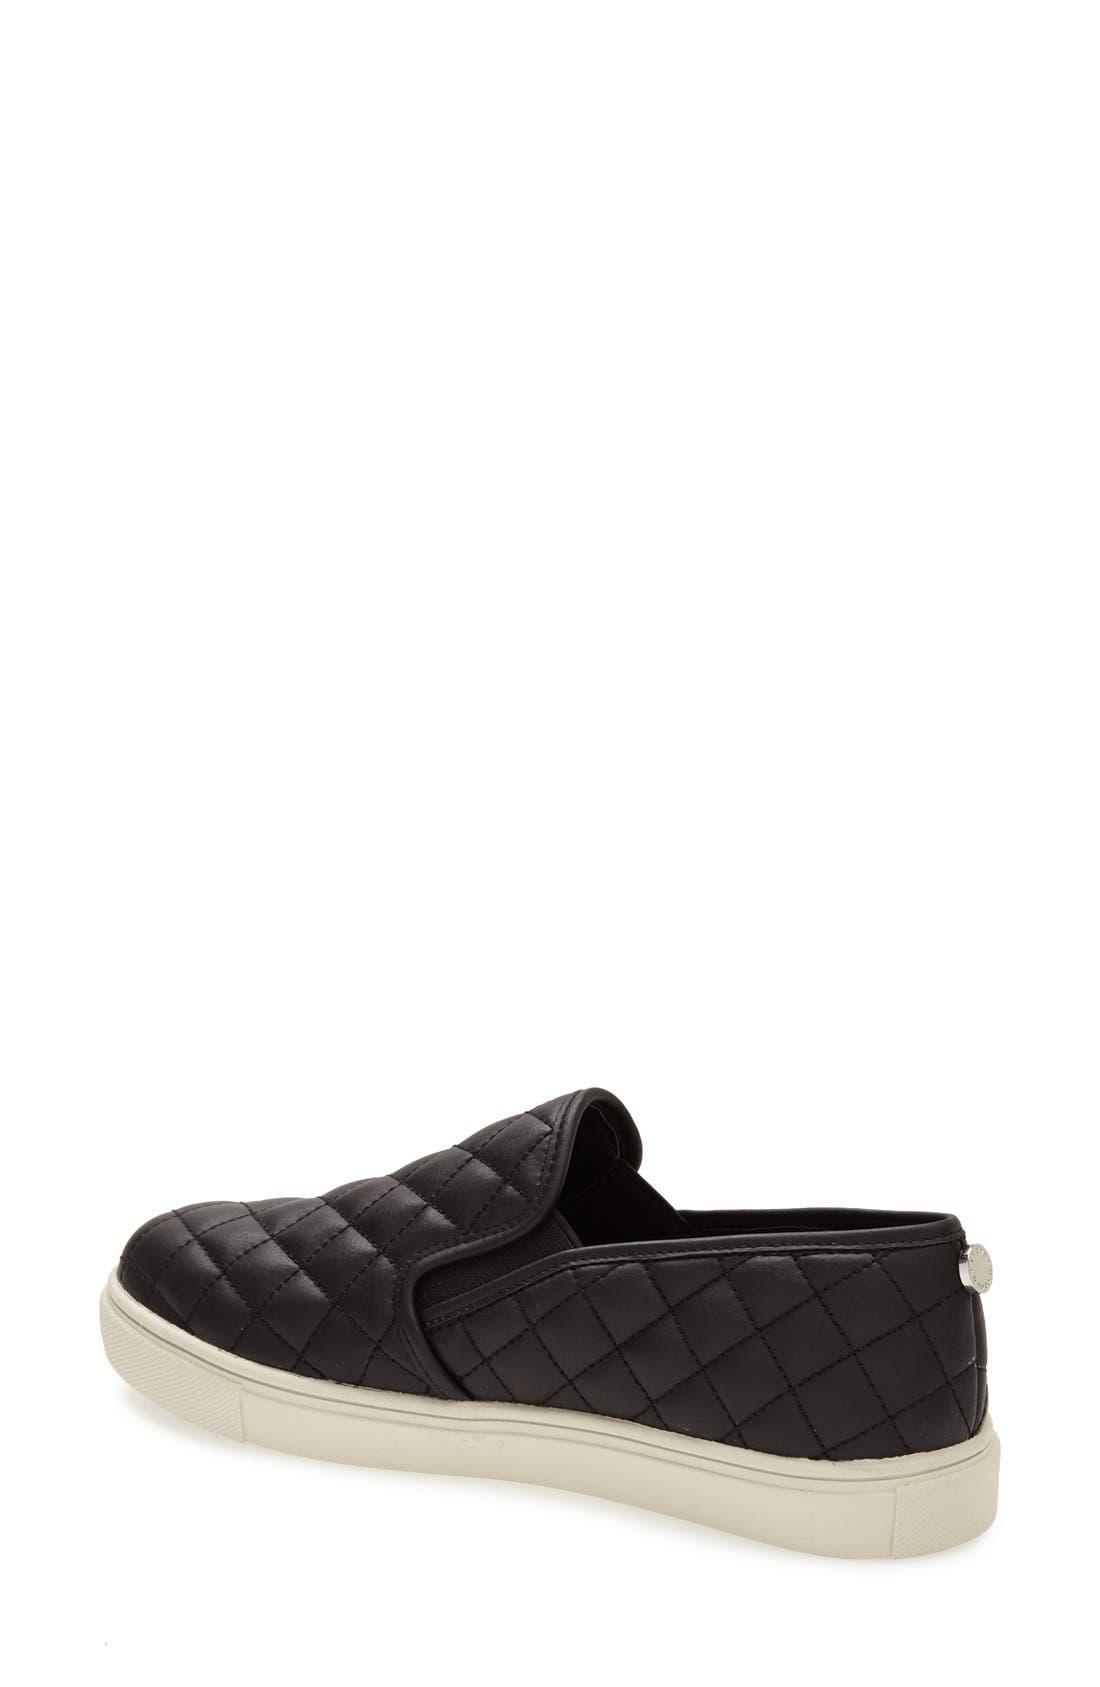 STEVE MADDEN, Ecentrcq Sneaker, Alternate thumbnail 3, color, BLACK FAUX LEATHER